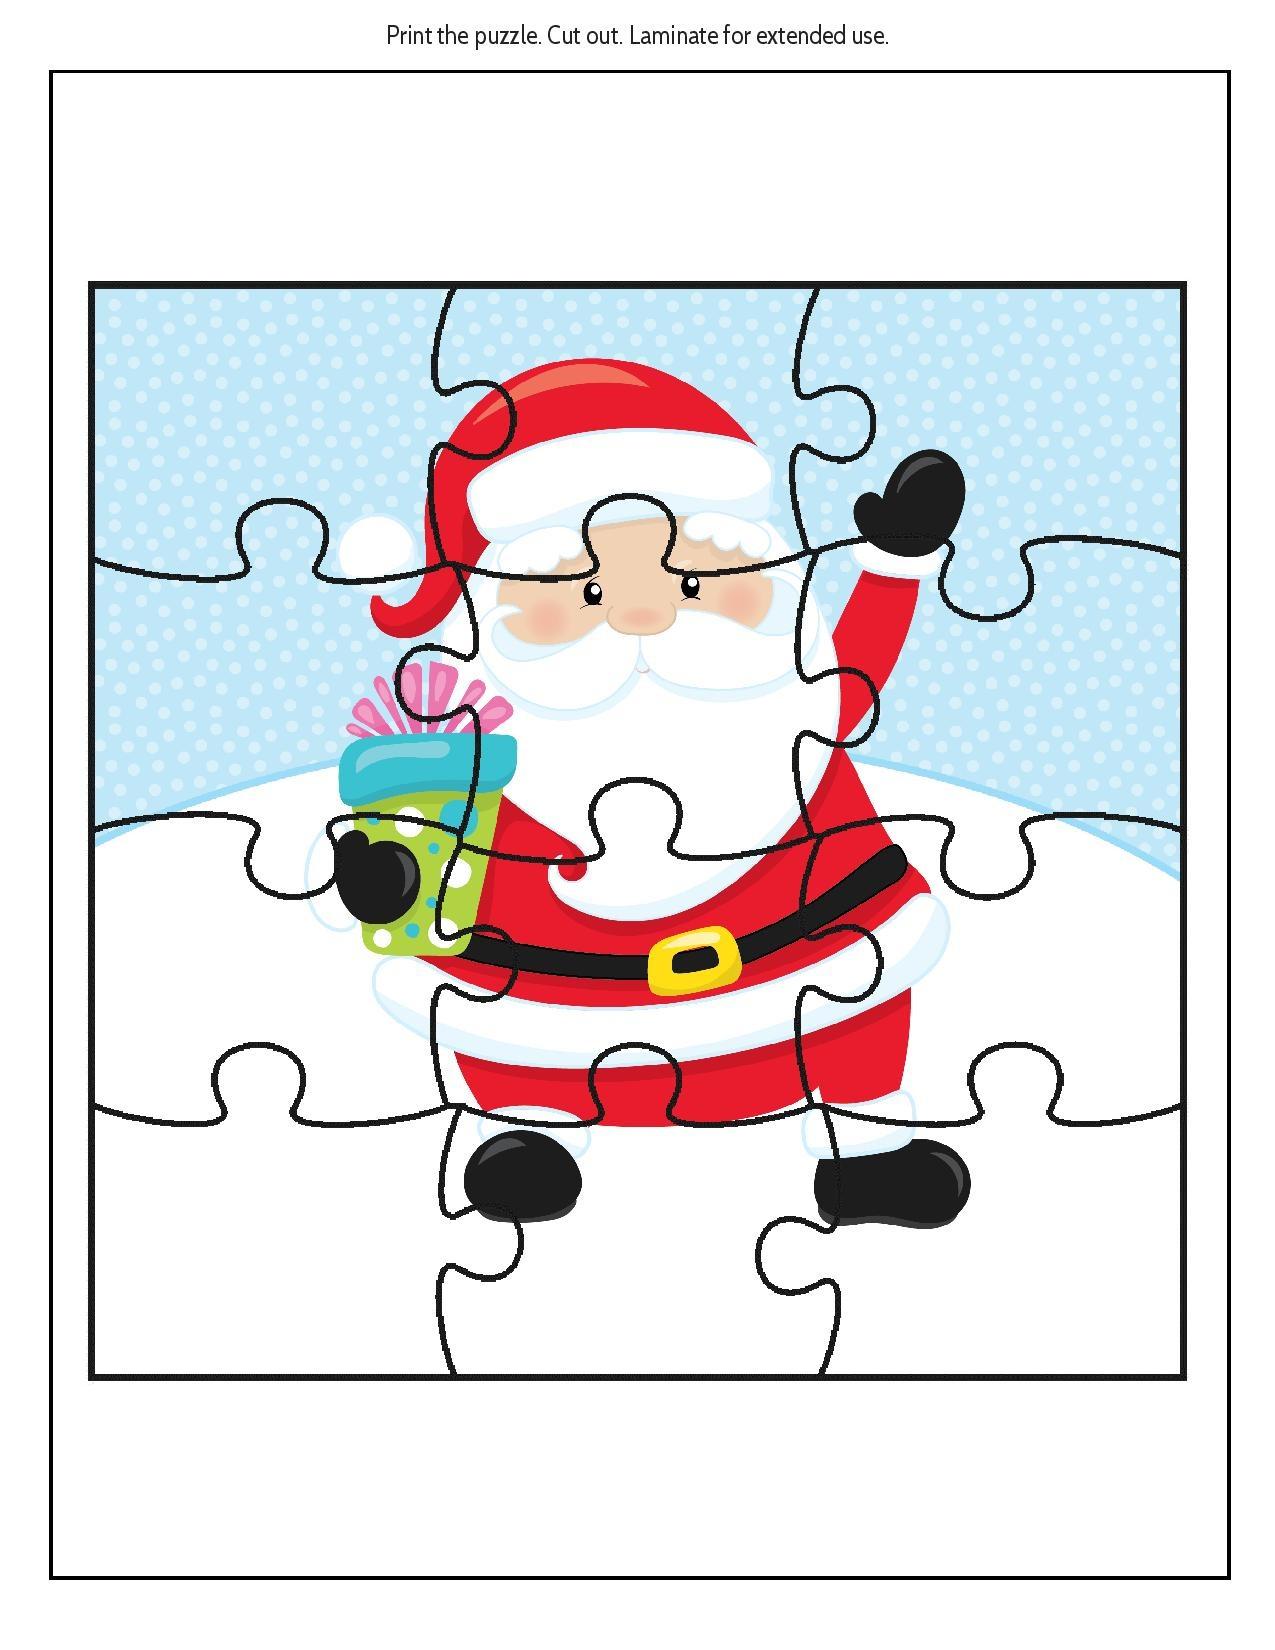 Free Educational Printable Christmas Puzzle Pack - Real And Quirky - Free Printable Christmas Puzzles